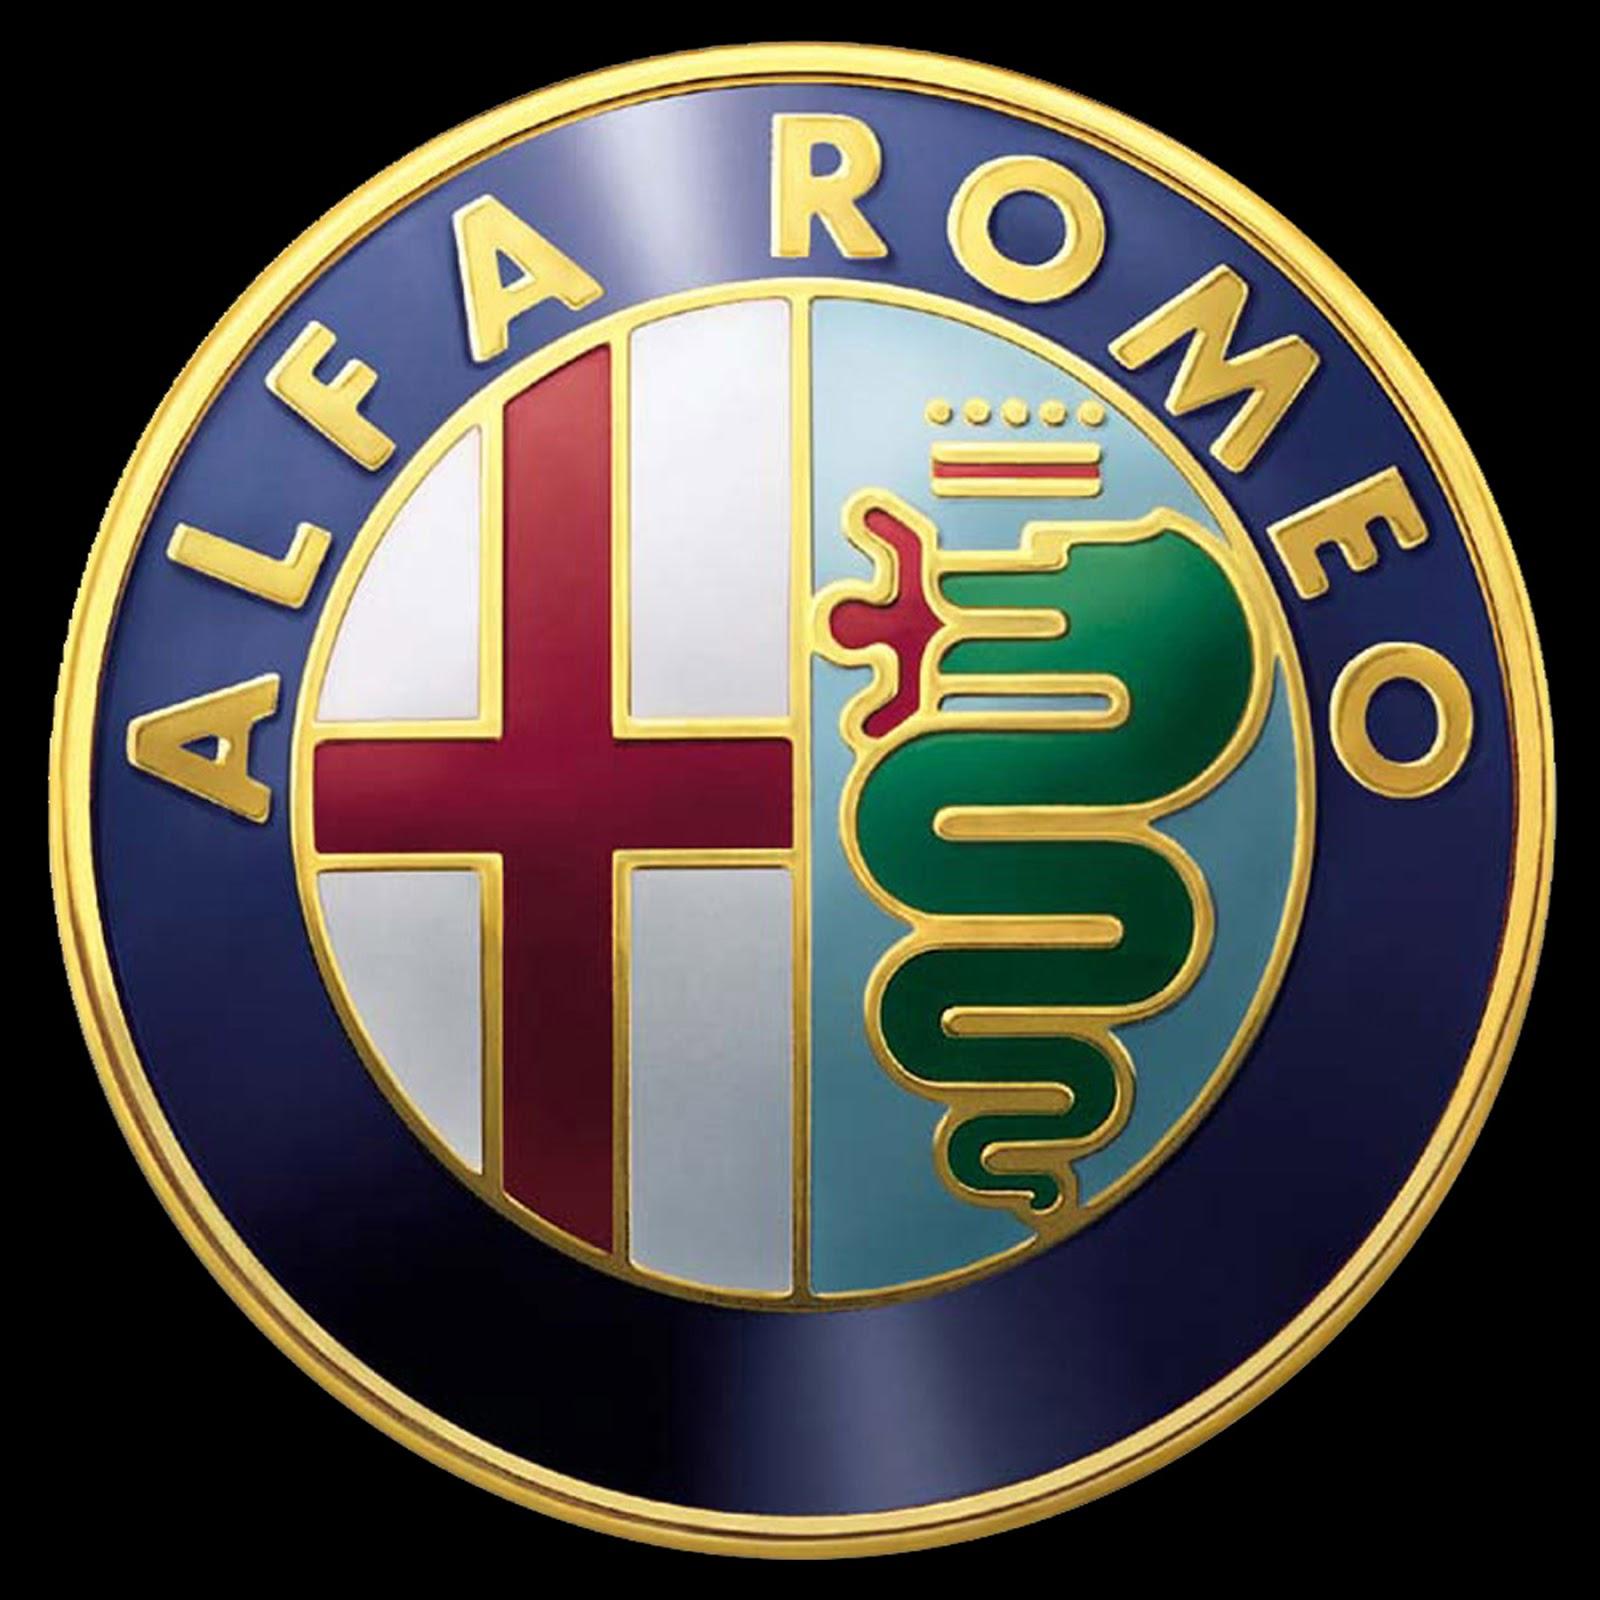 Alfa Romeo Logo, Alfa Romeo Car Symbol Meaning  Car Brand